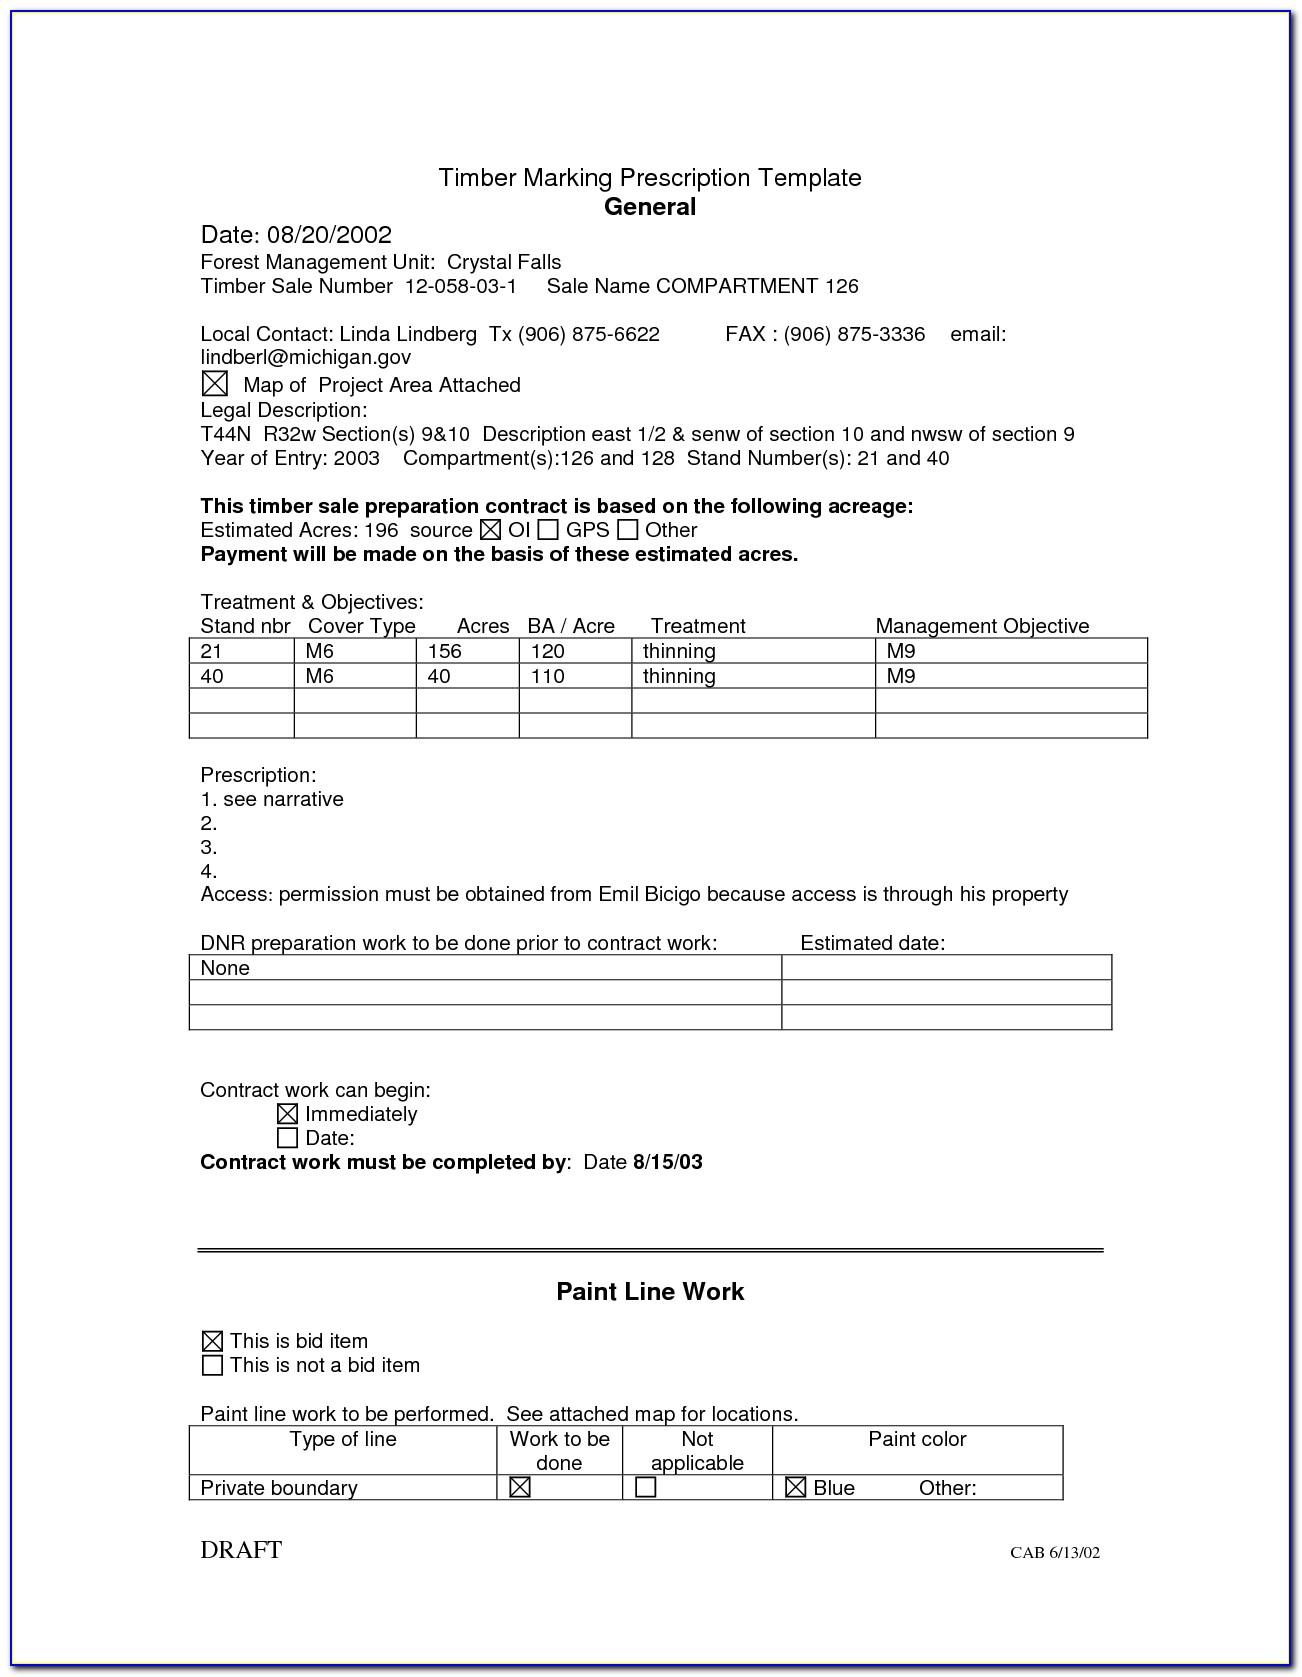 Sample Painting Bid Proposal Form